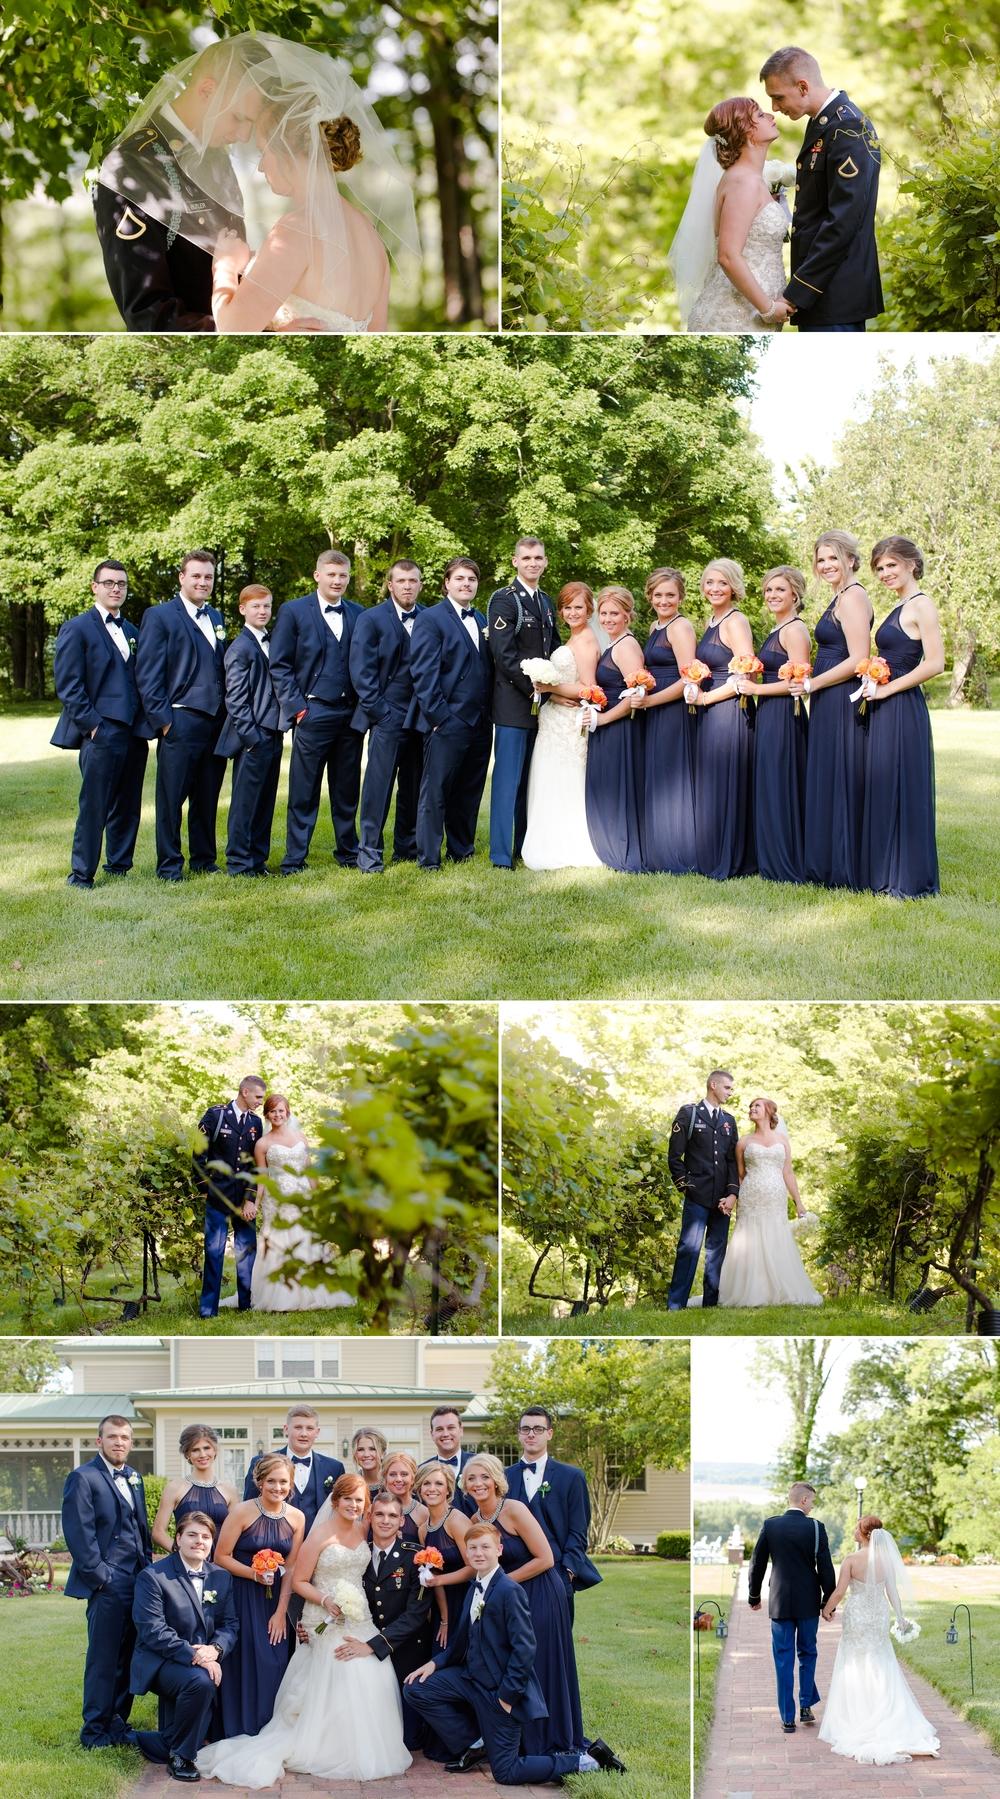 riverbend_chapel_washington_mo_wedding_photography_outdoor_venue_st_louis 5.jpg